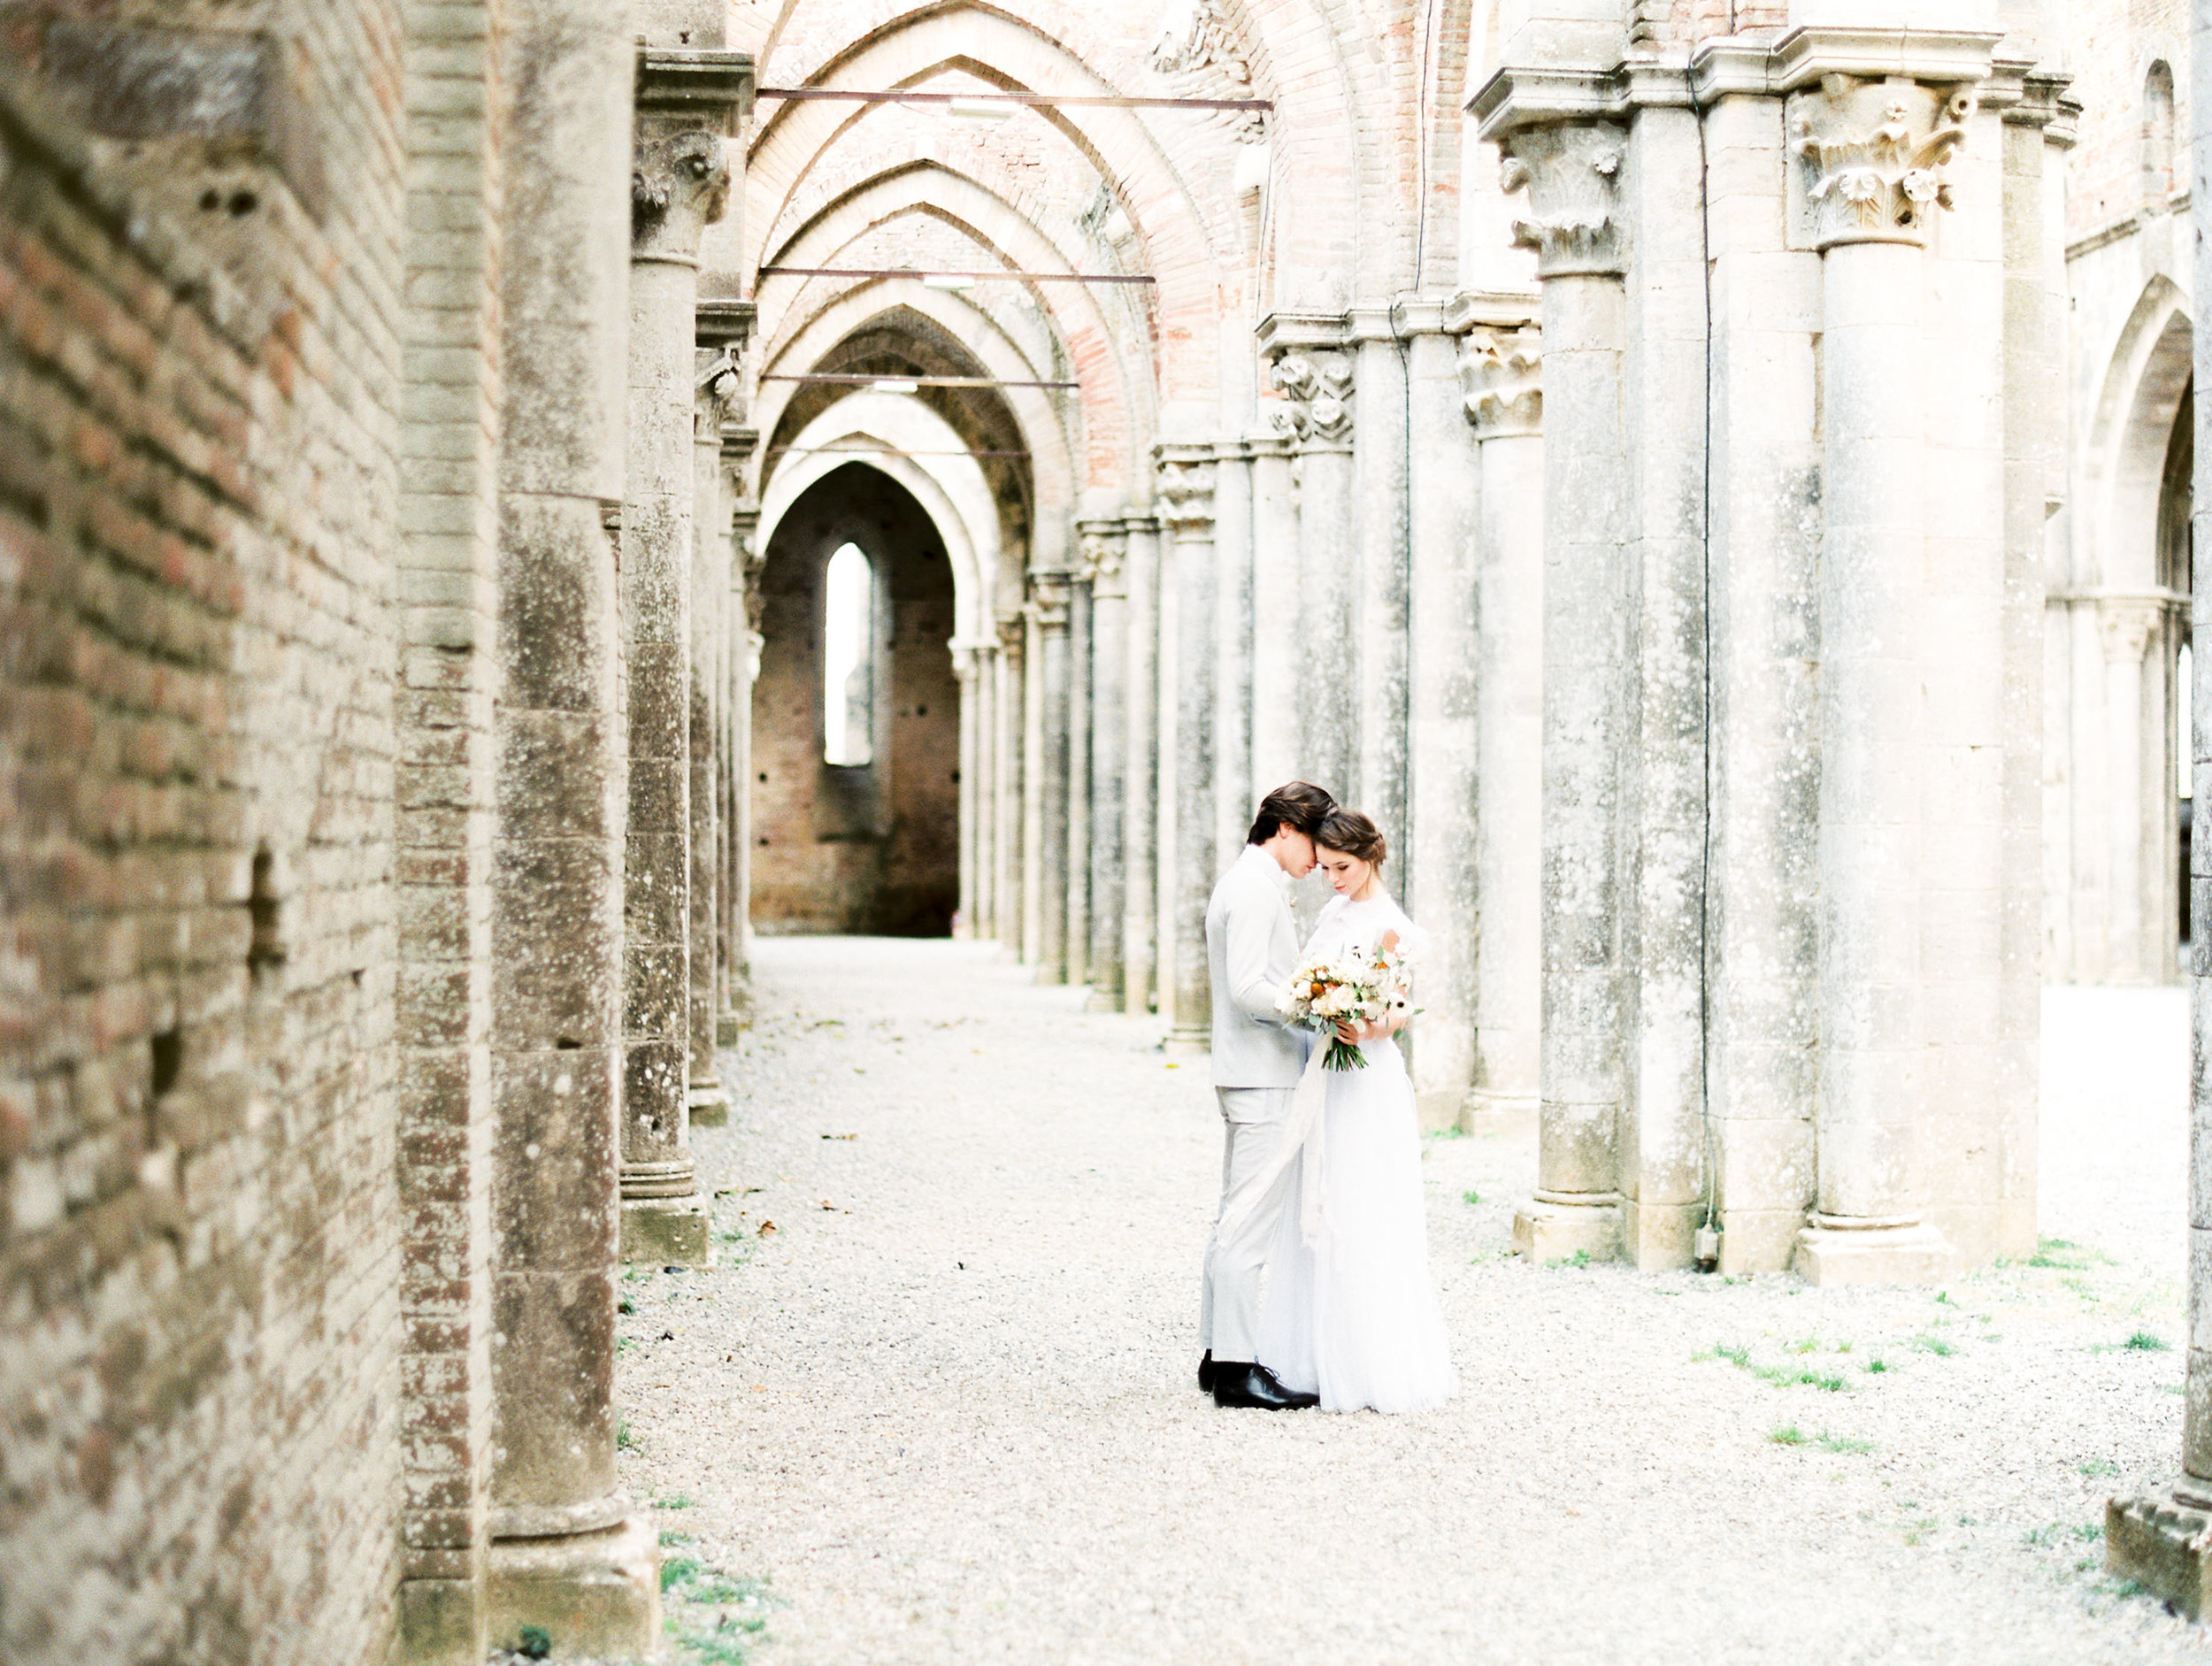 romantic-italy-wedding-in-tuscany-83.jpg